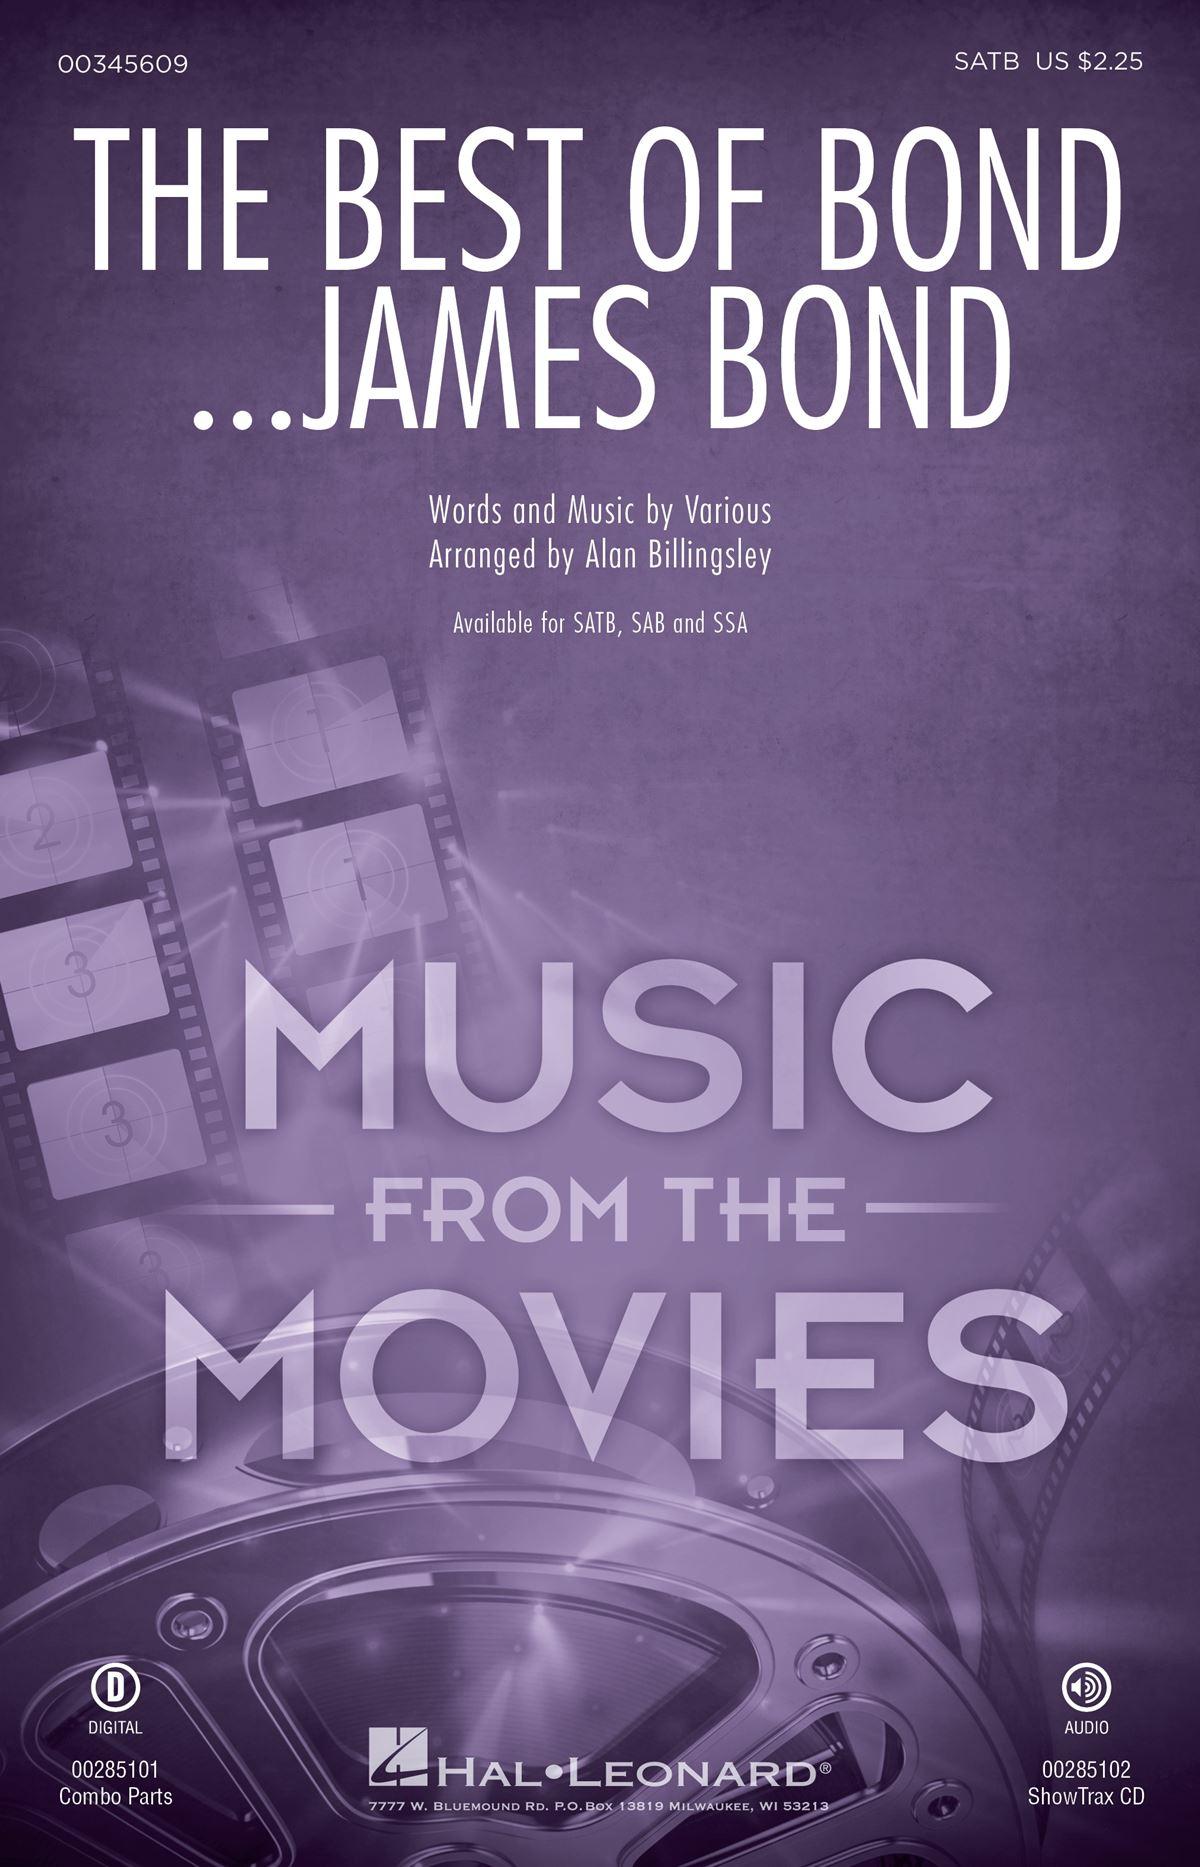 The Best of Bond... James Bond (Choral Medley): Mixed Choir a Cappella: Vocal